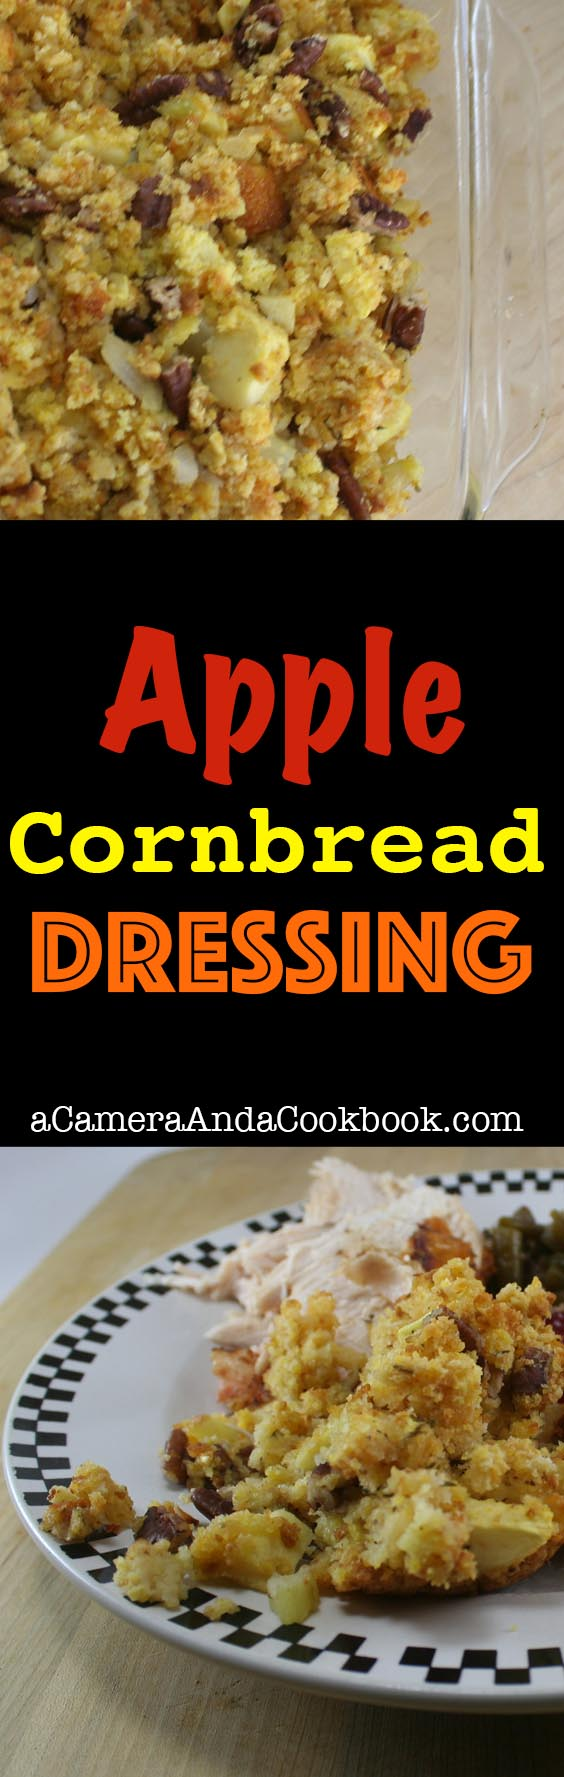 Apple Cornbread Dressing2